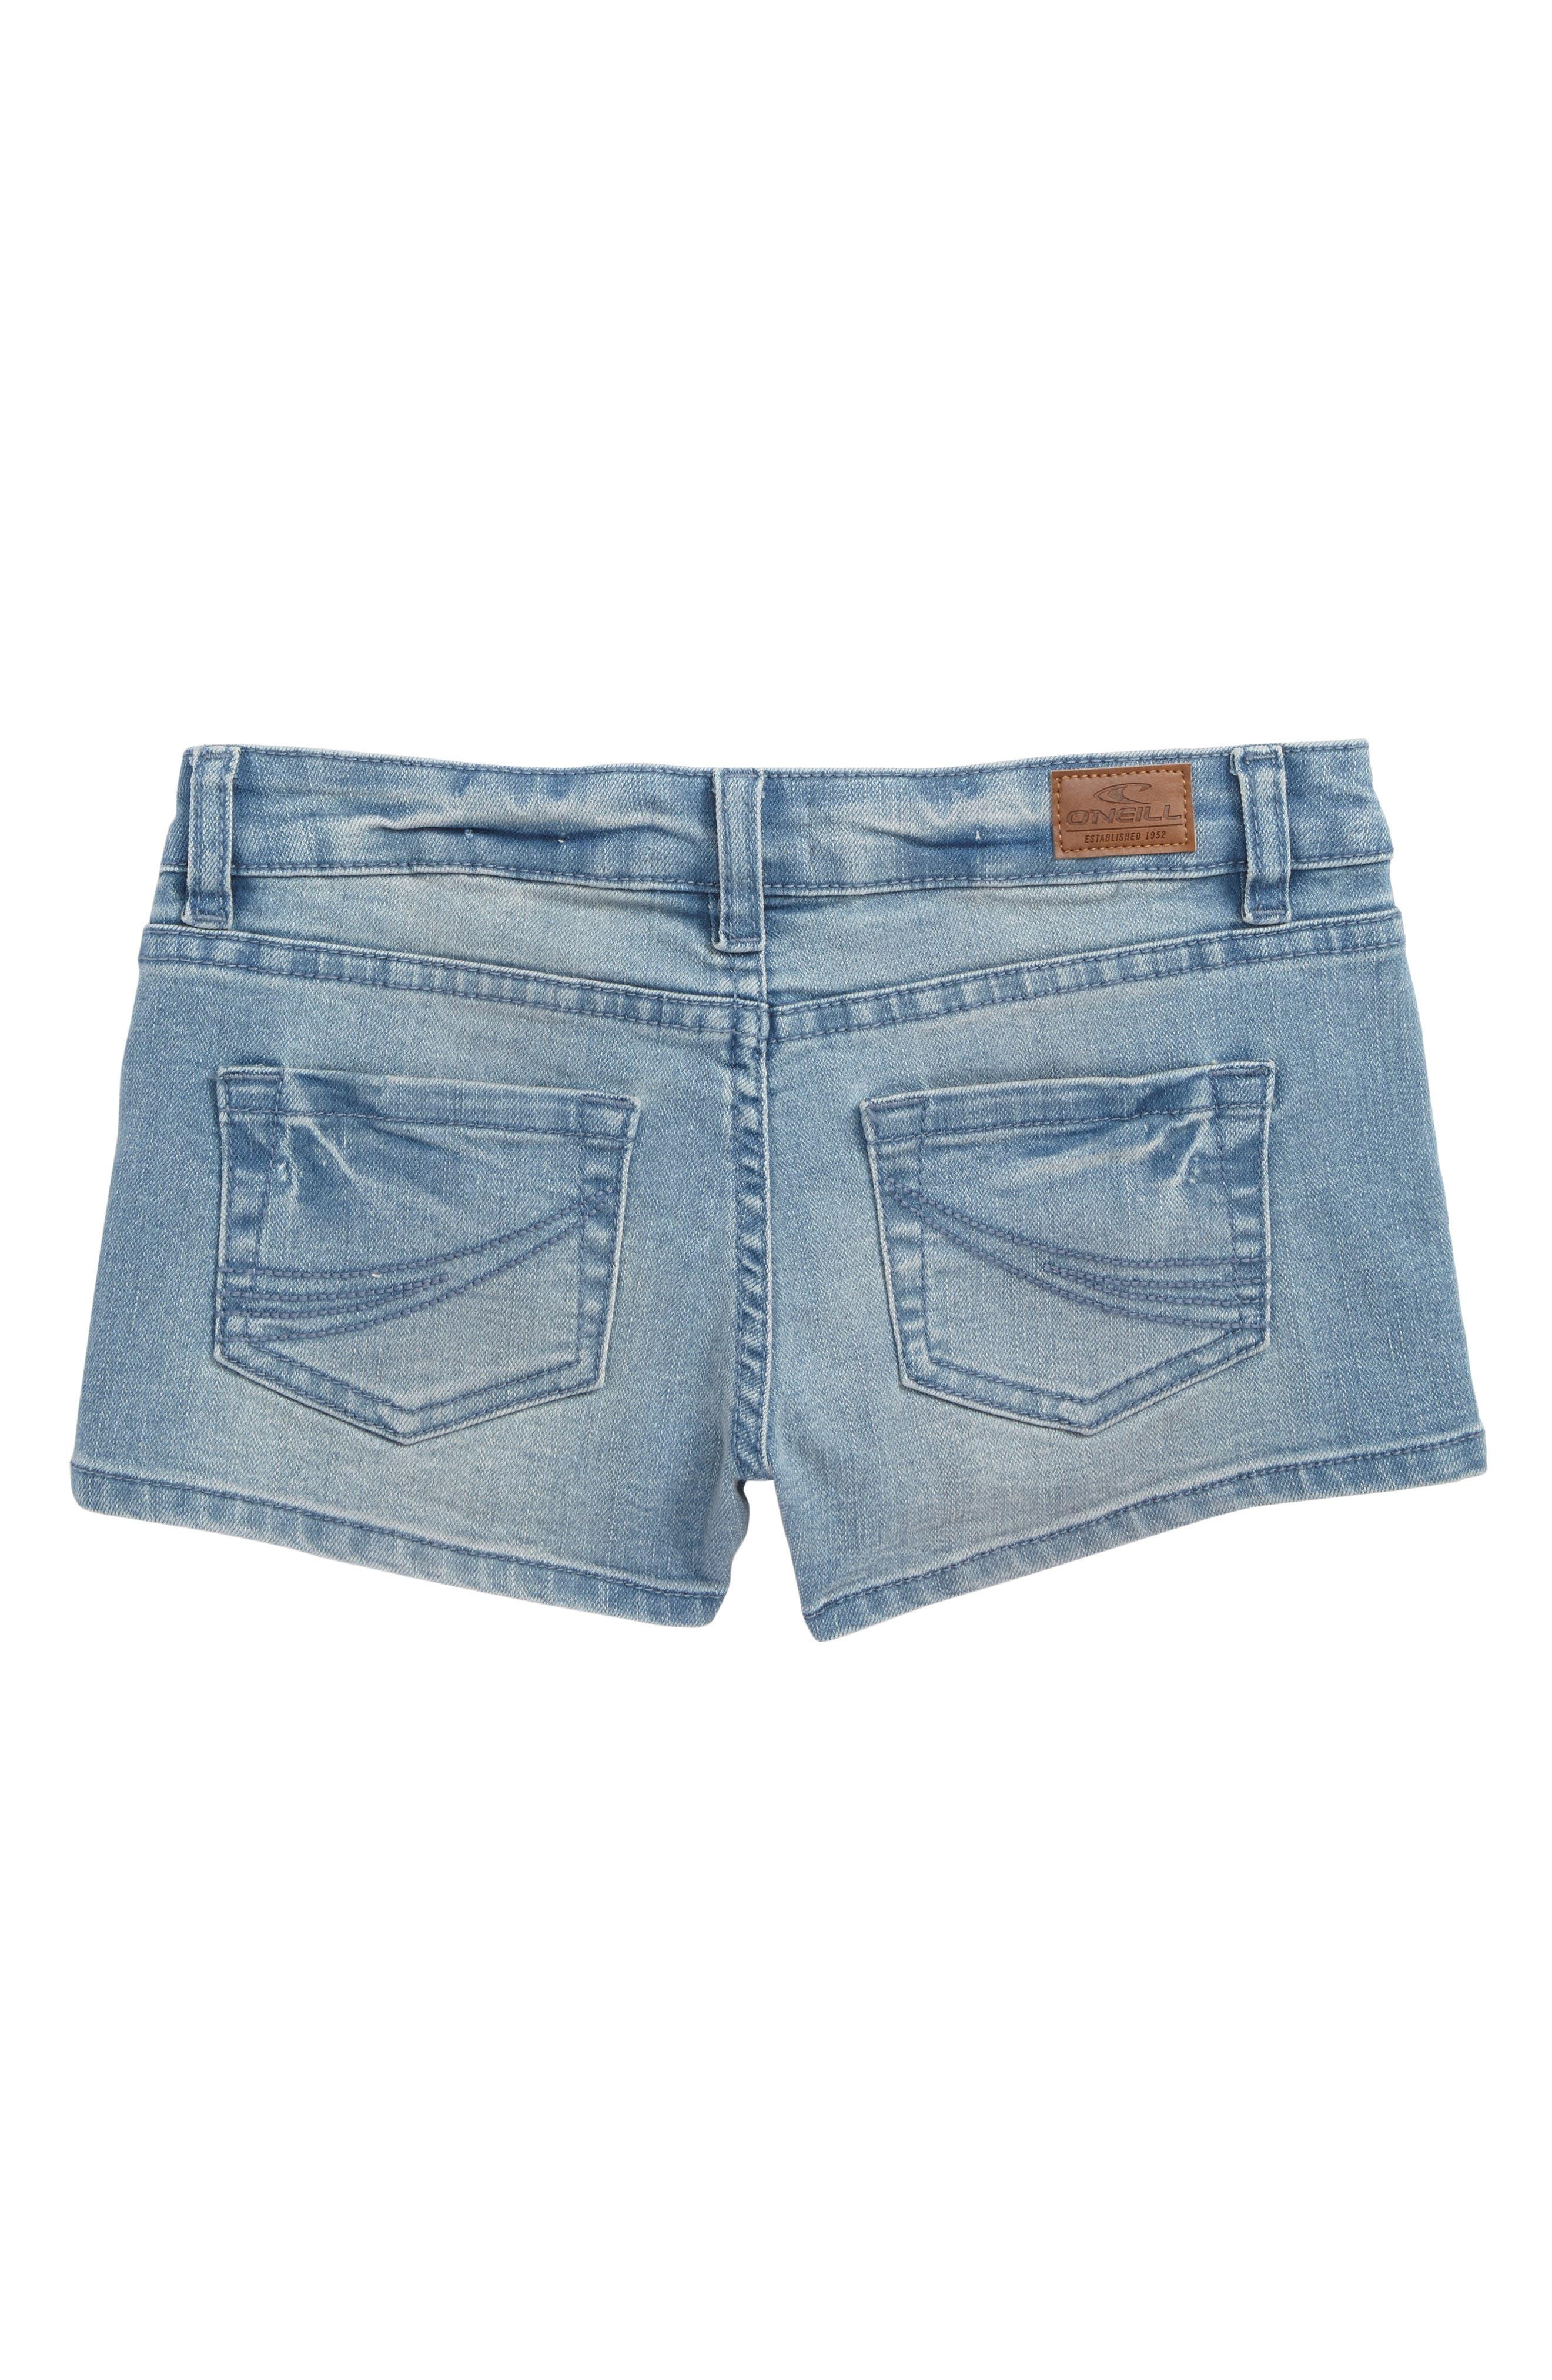 Alternate Image 2  - O'Neiil Waidley Denim Shorts (Big Girls)